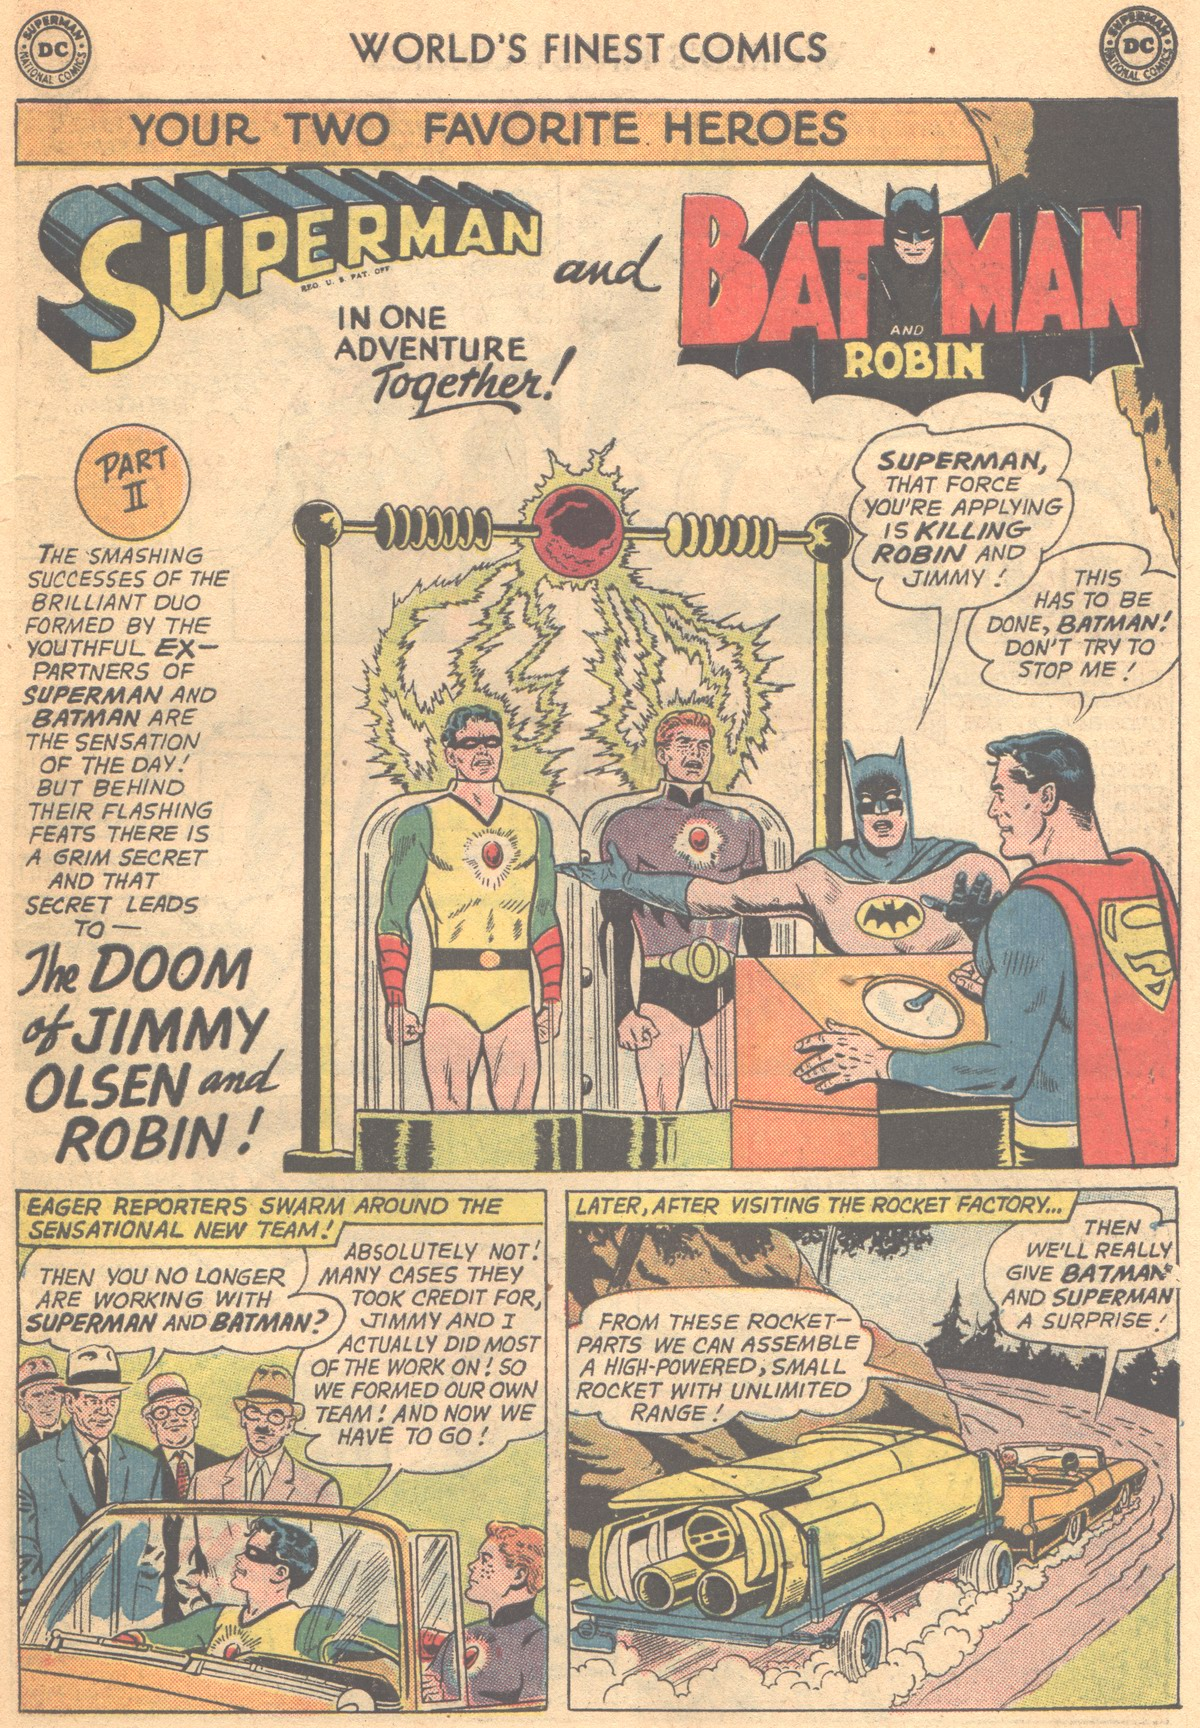 Read online World's Finest Comics comic -  Issue #147 - 15